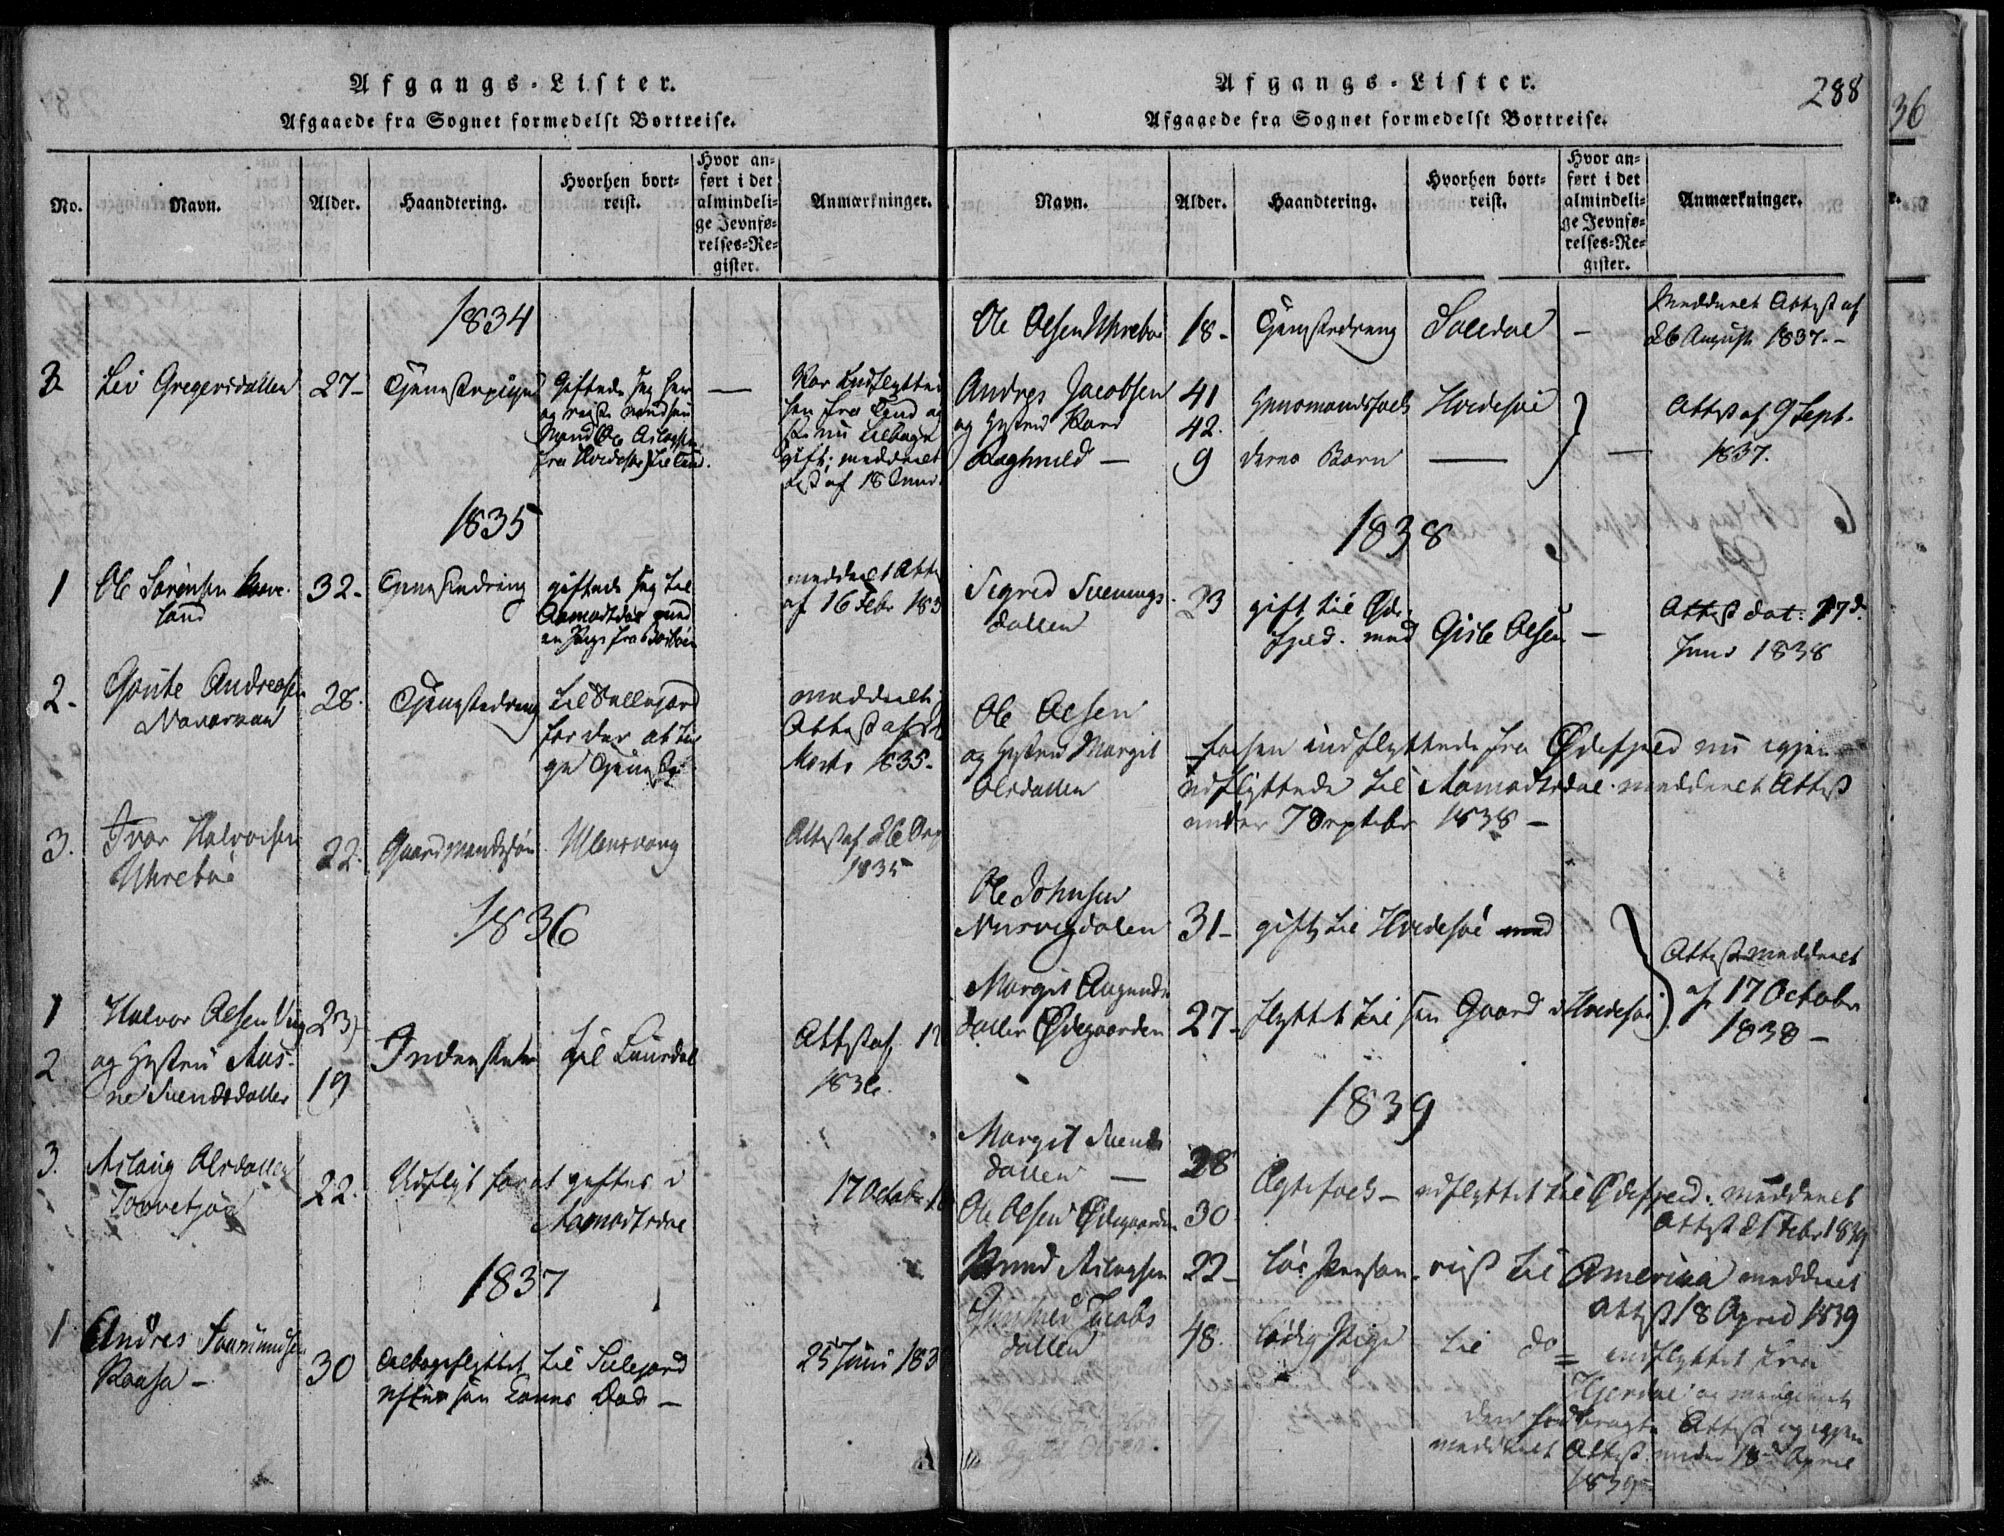 SAKO, Rauland kirkebøker, F/Fa/L0001: Ministerialbok nr. 1, 1814-1859, s. 288